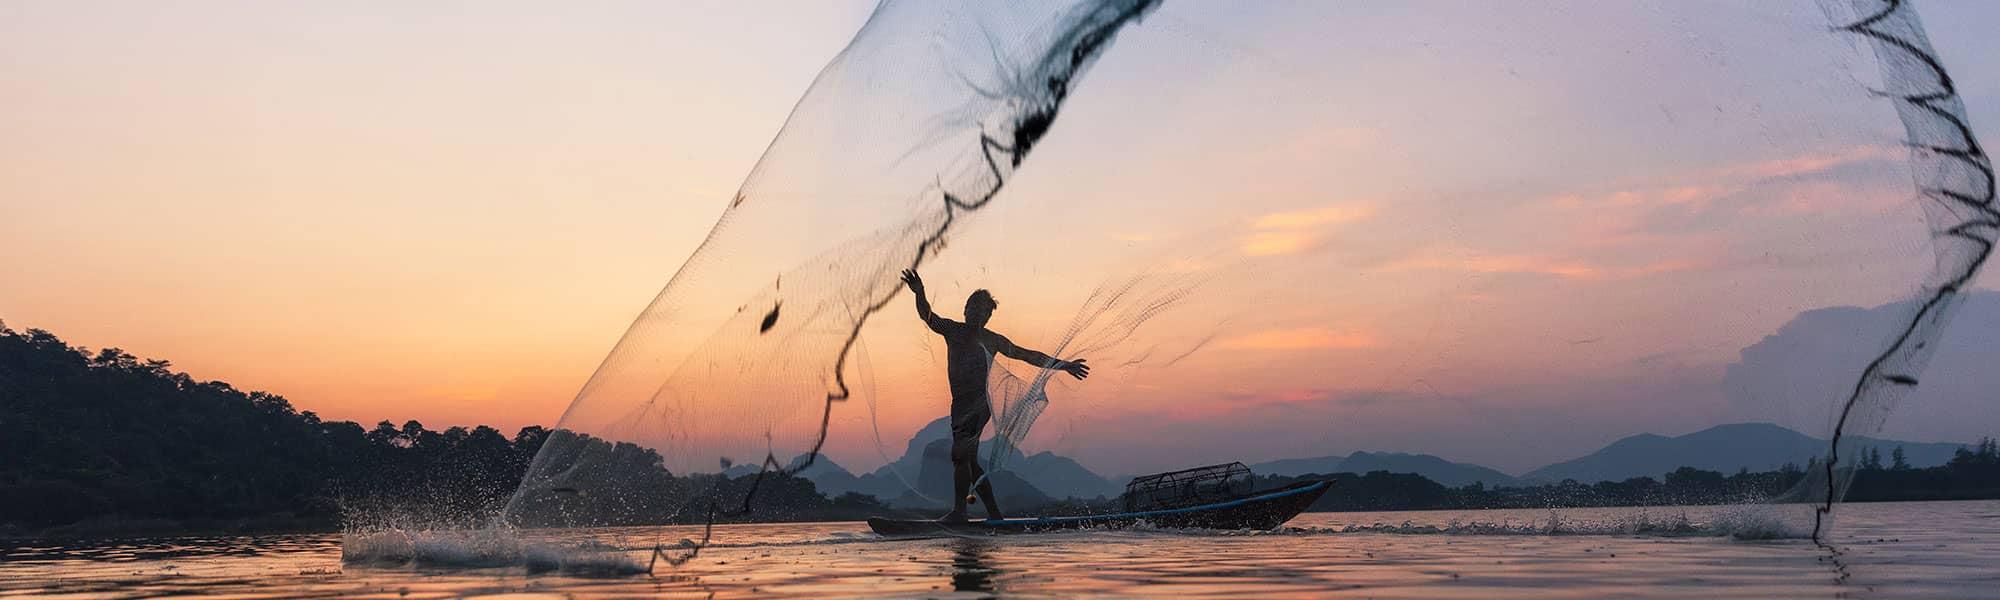 Sunset Casting Fishing Net